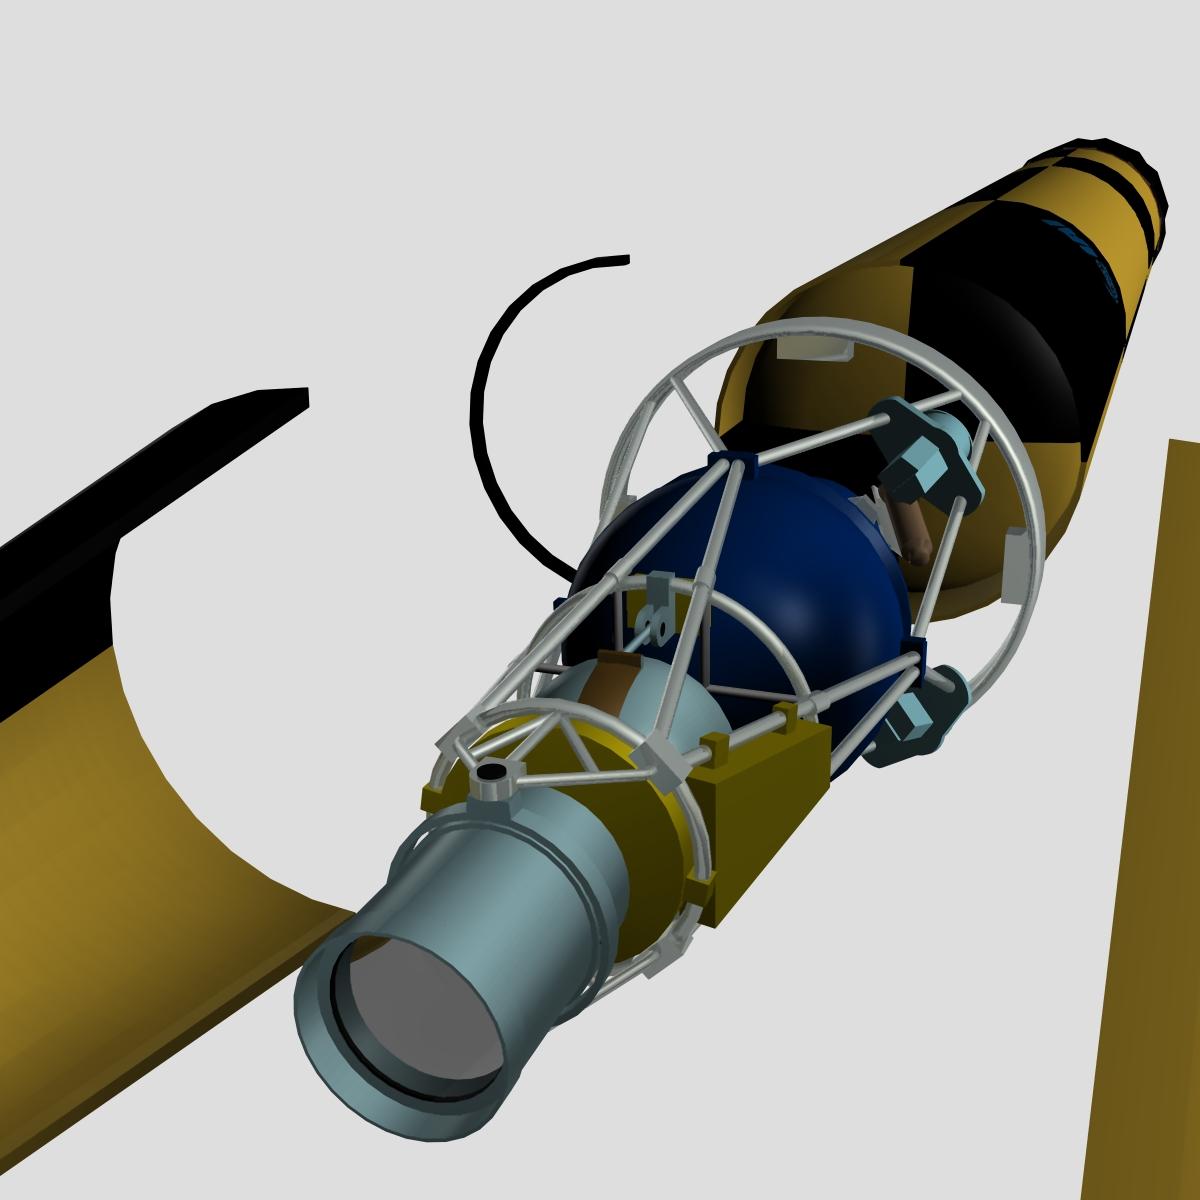 israeli arrow 3 missile 3d model 3ds dxf cob x other obj 136286